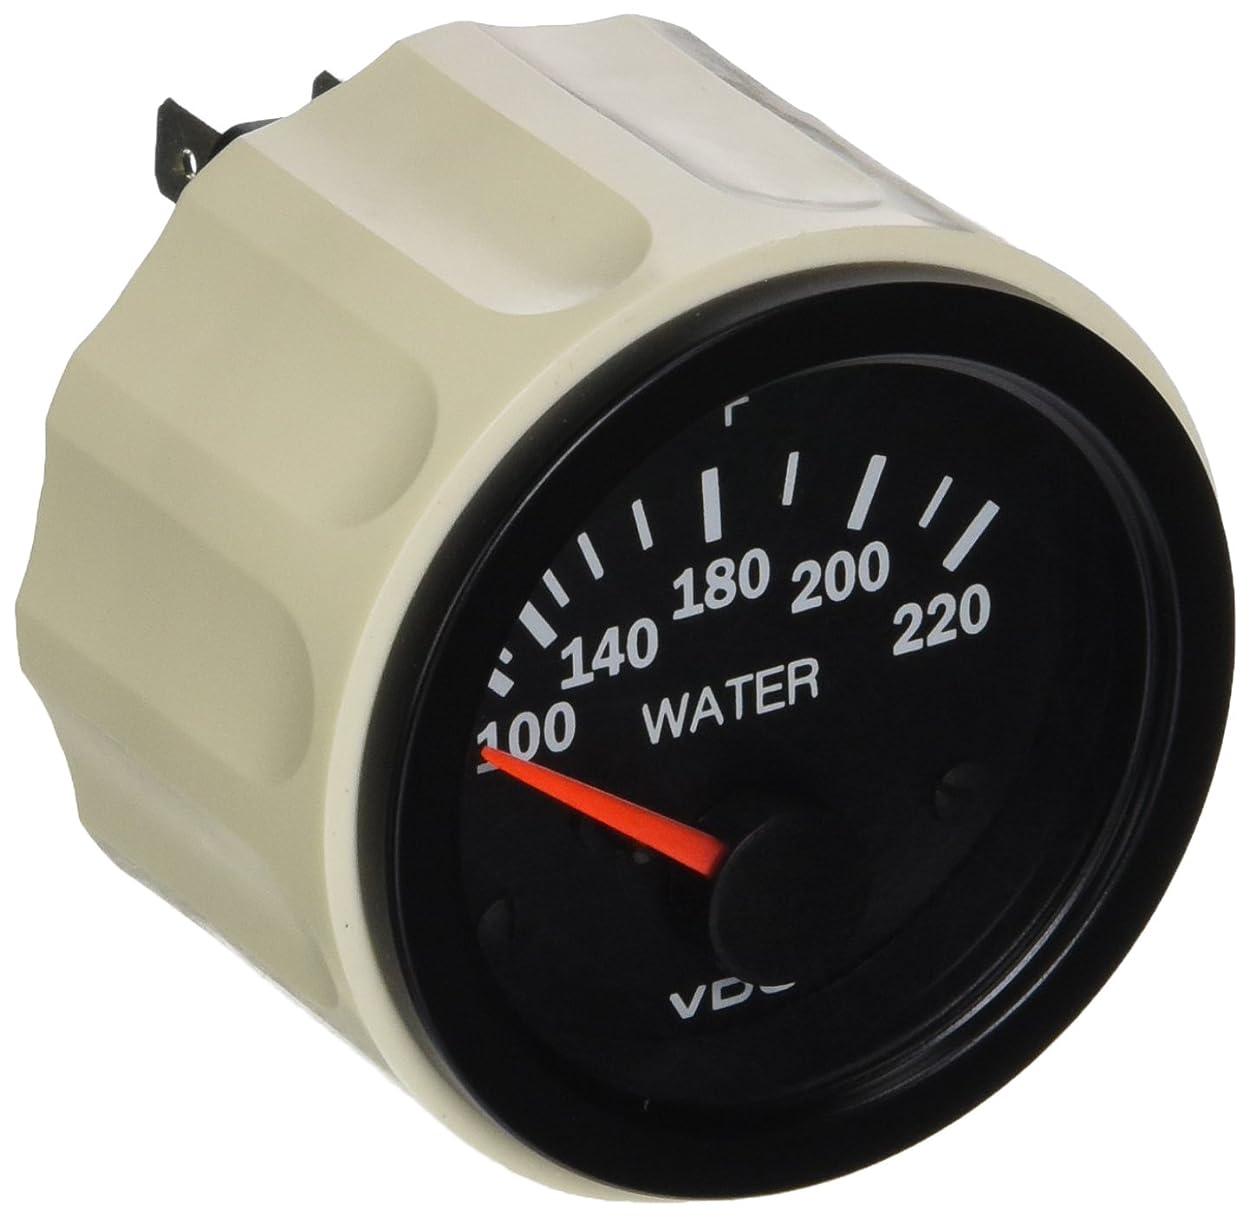 VDO 310 104 Water Temperature Gauge hp28045597946